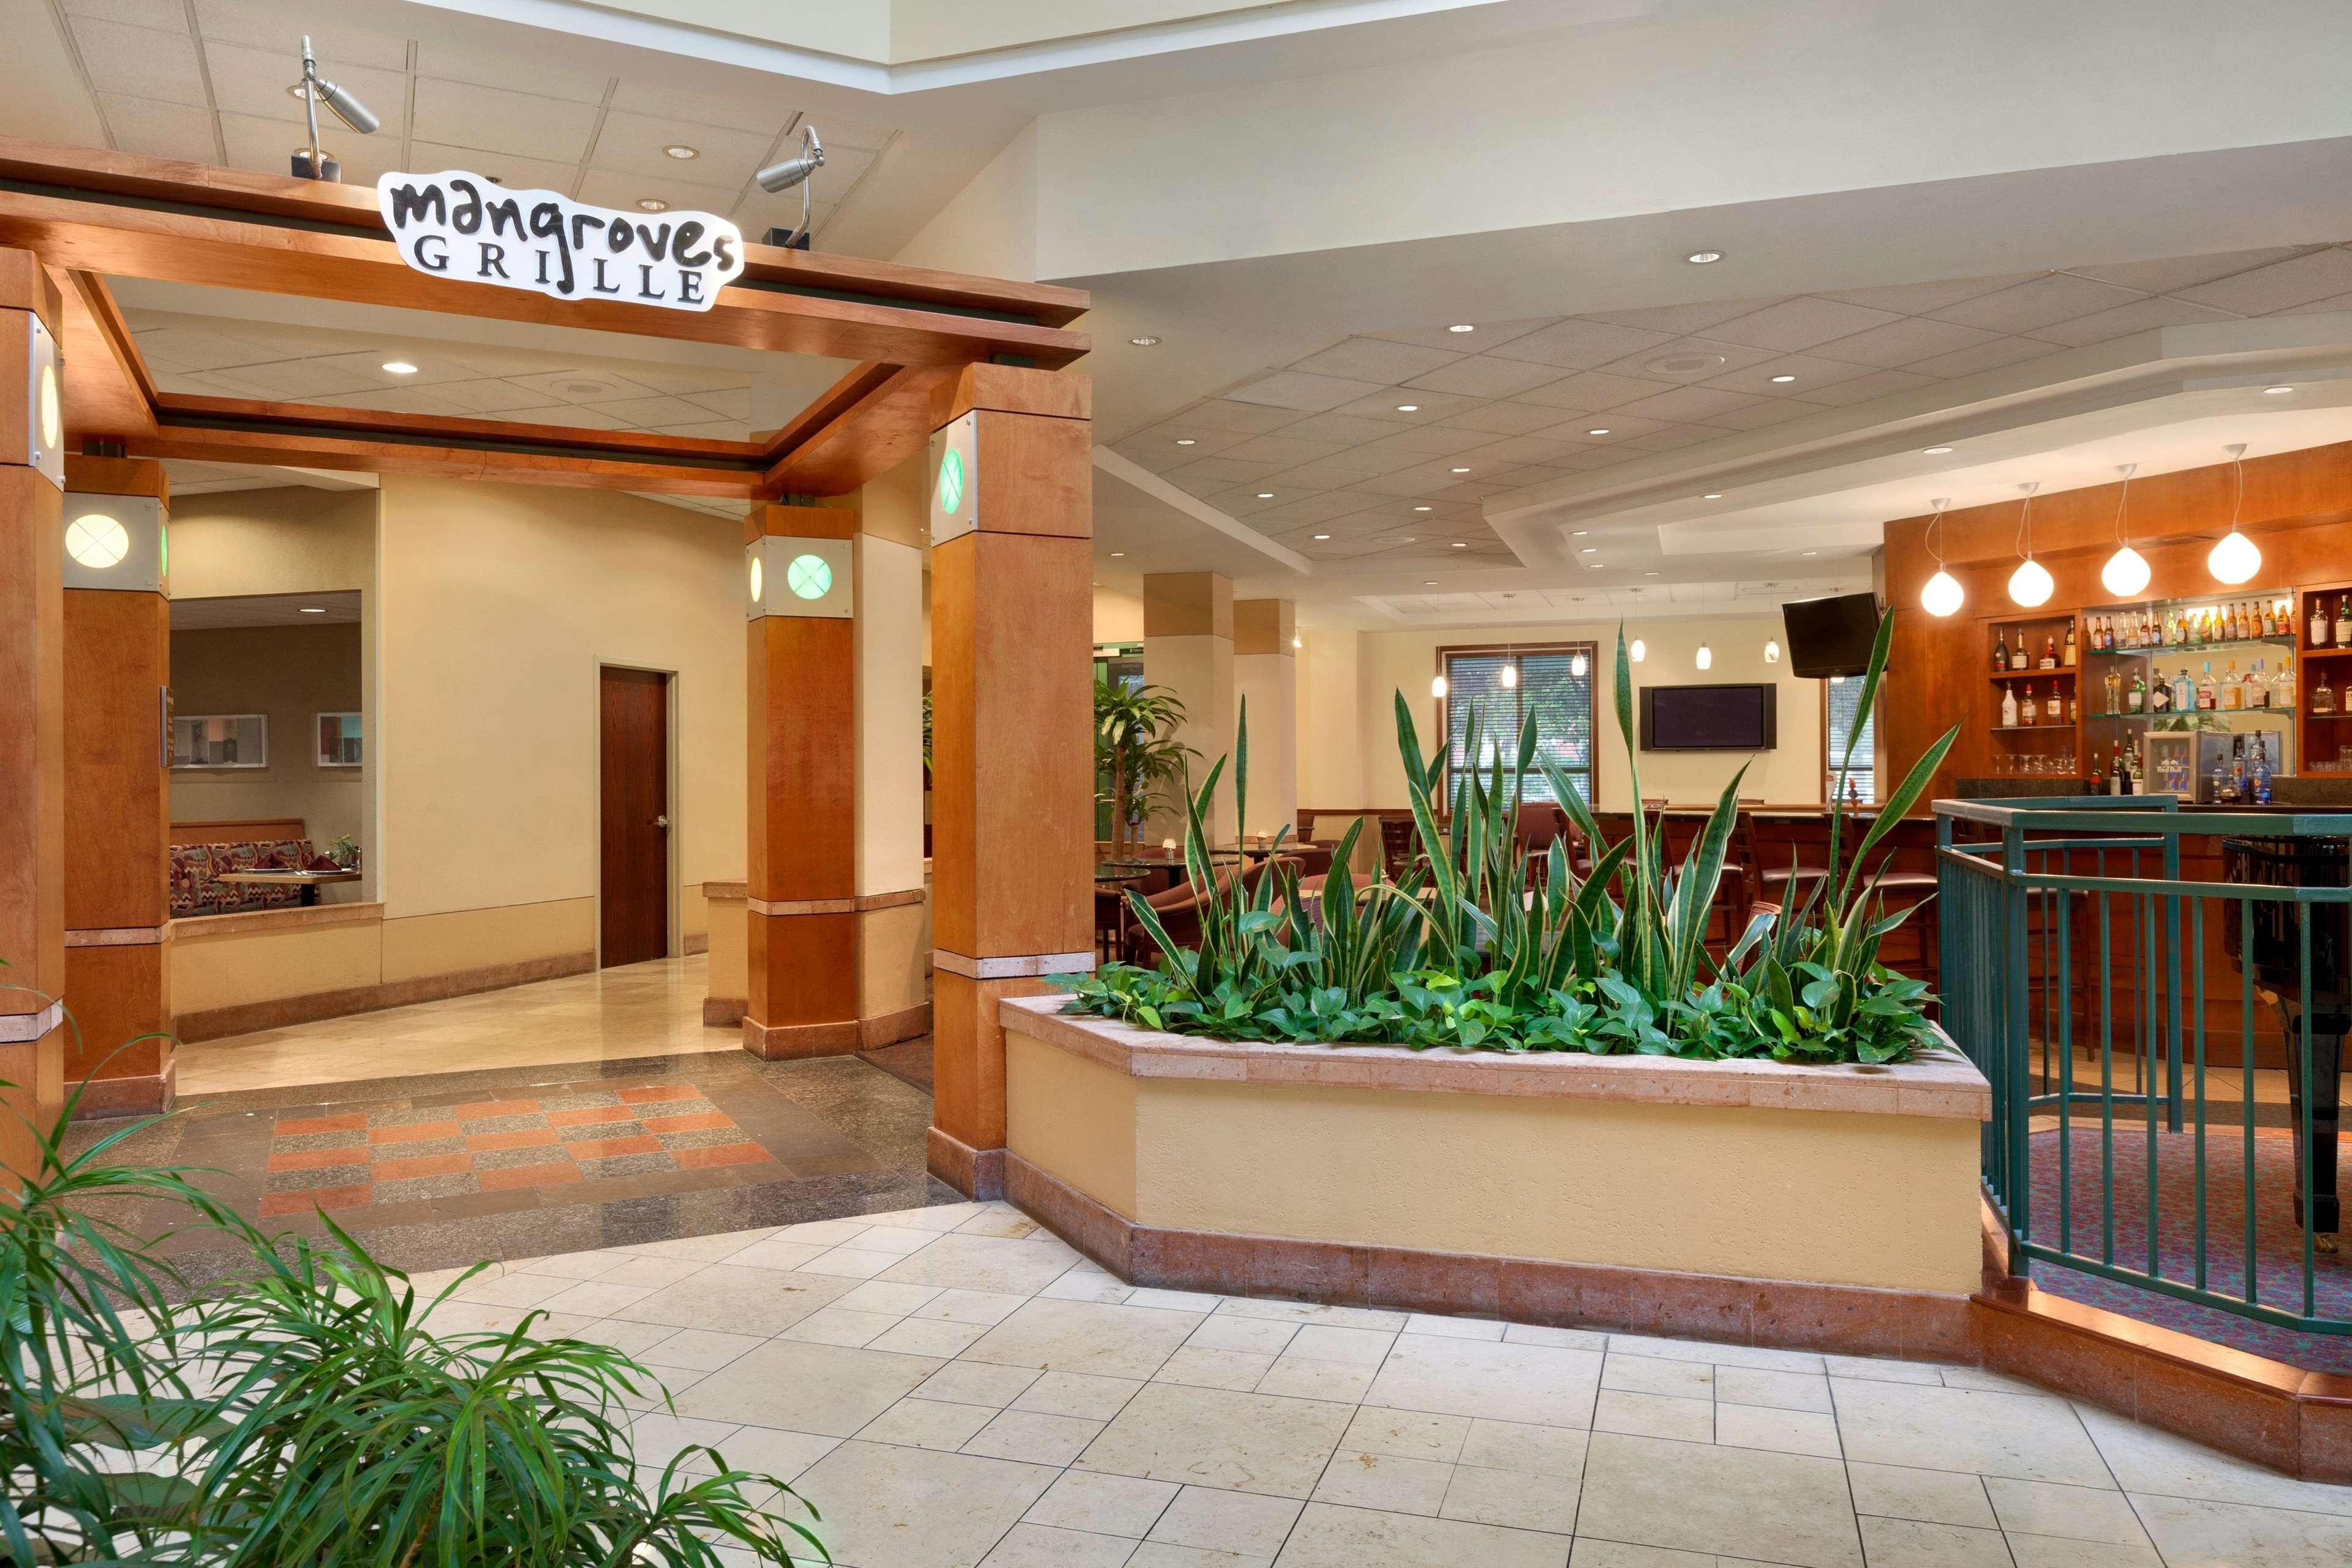 Embassy suites by hilton tampa usf near busch gardens - Coca cola busch gardens discount ...